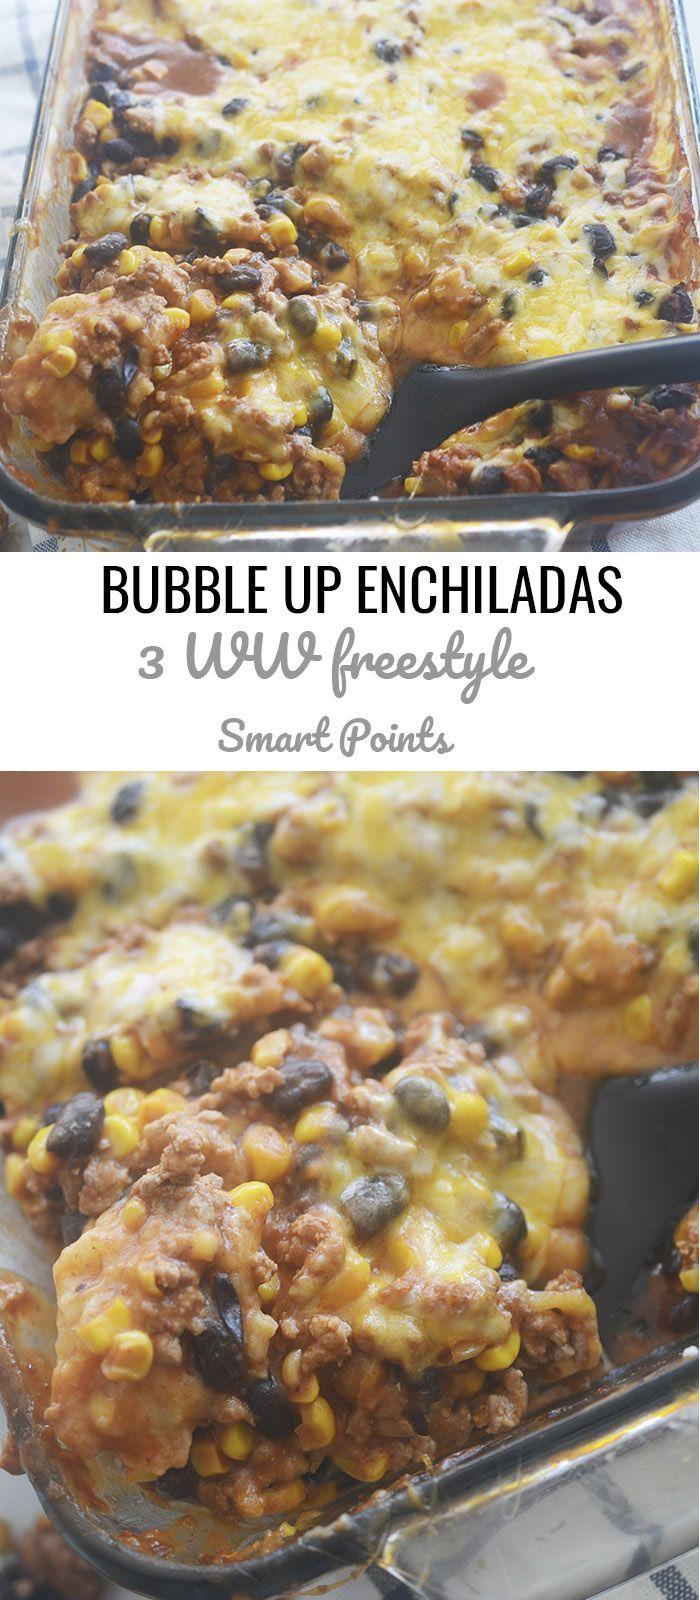 Bubbleup enchiladas with 2id recipe quiet book pinterest bubbleup enchiladas with 2id recipe quiet book pinterest dough recipe mexicans and recipes forumfinder Gallery